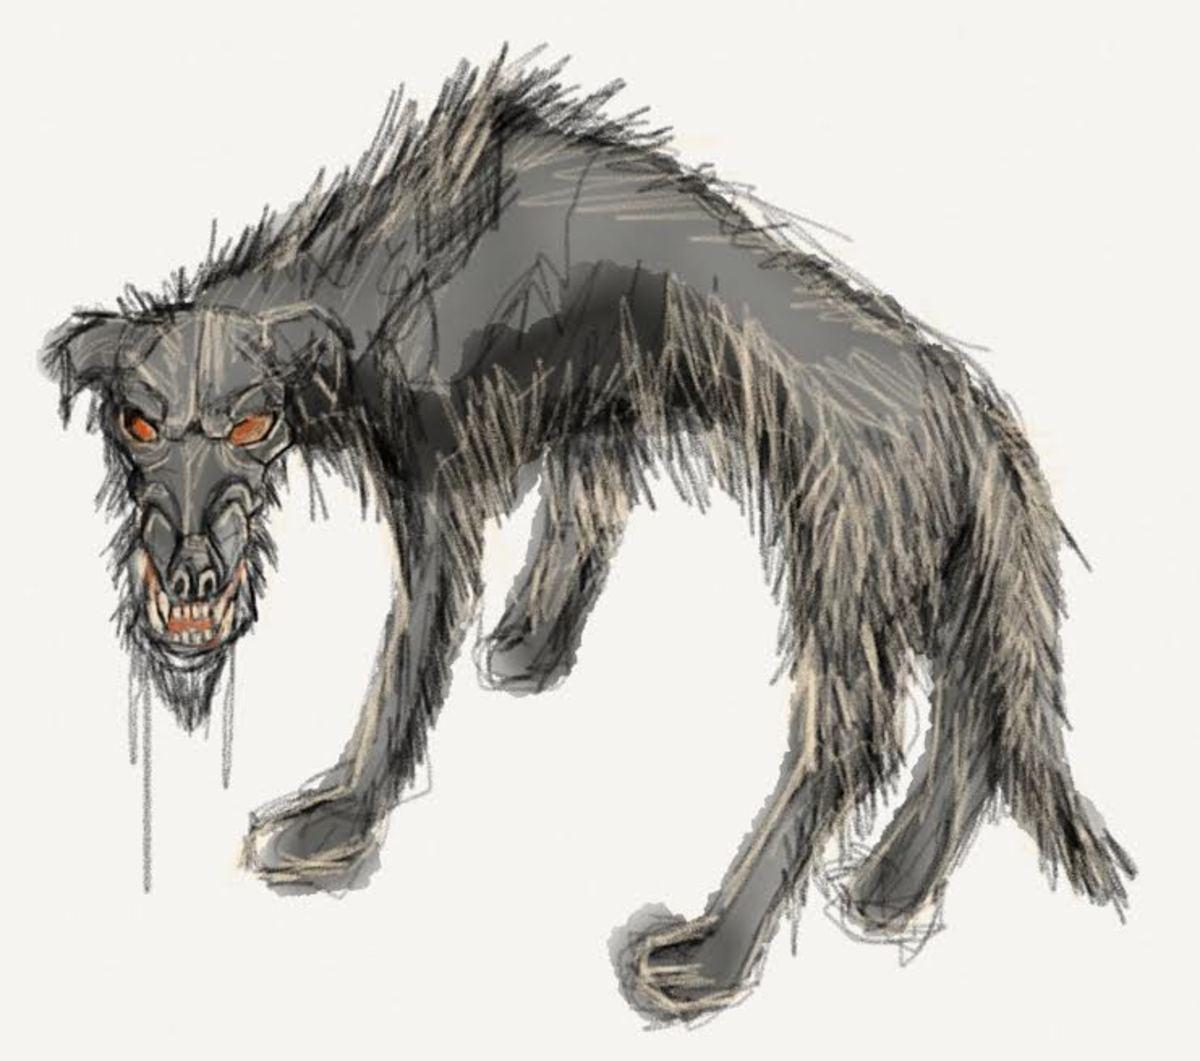 Black dog by Vasilios Markousis. Used with permission.